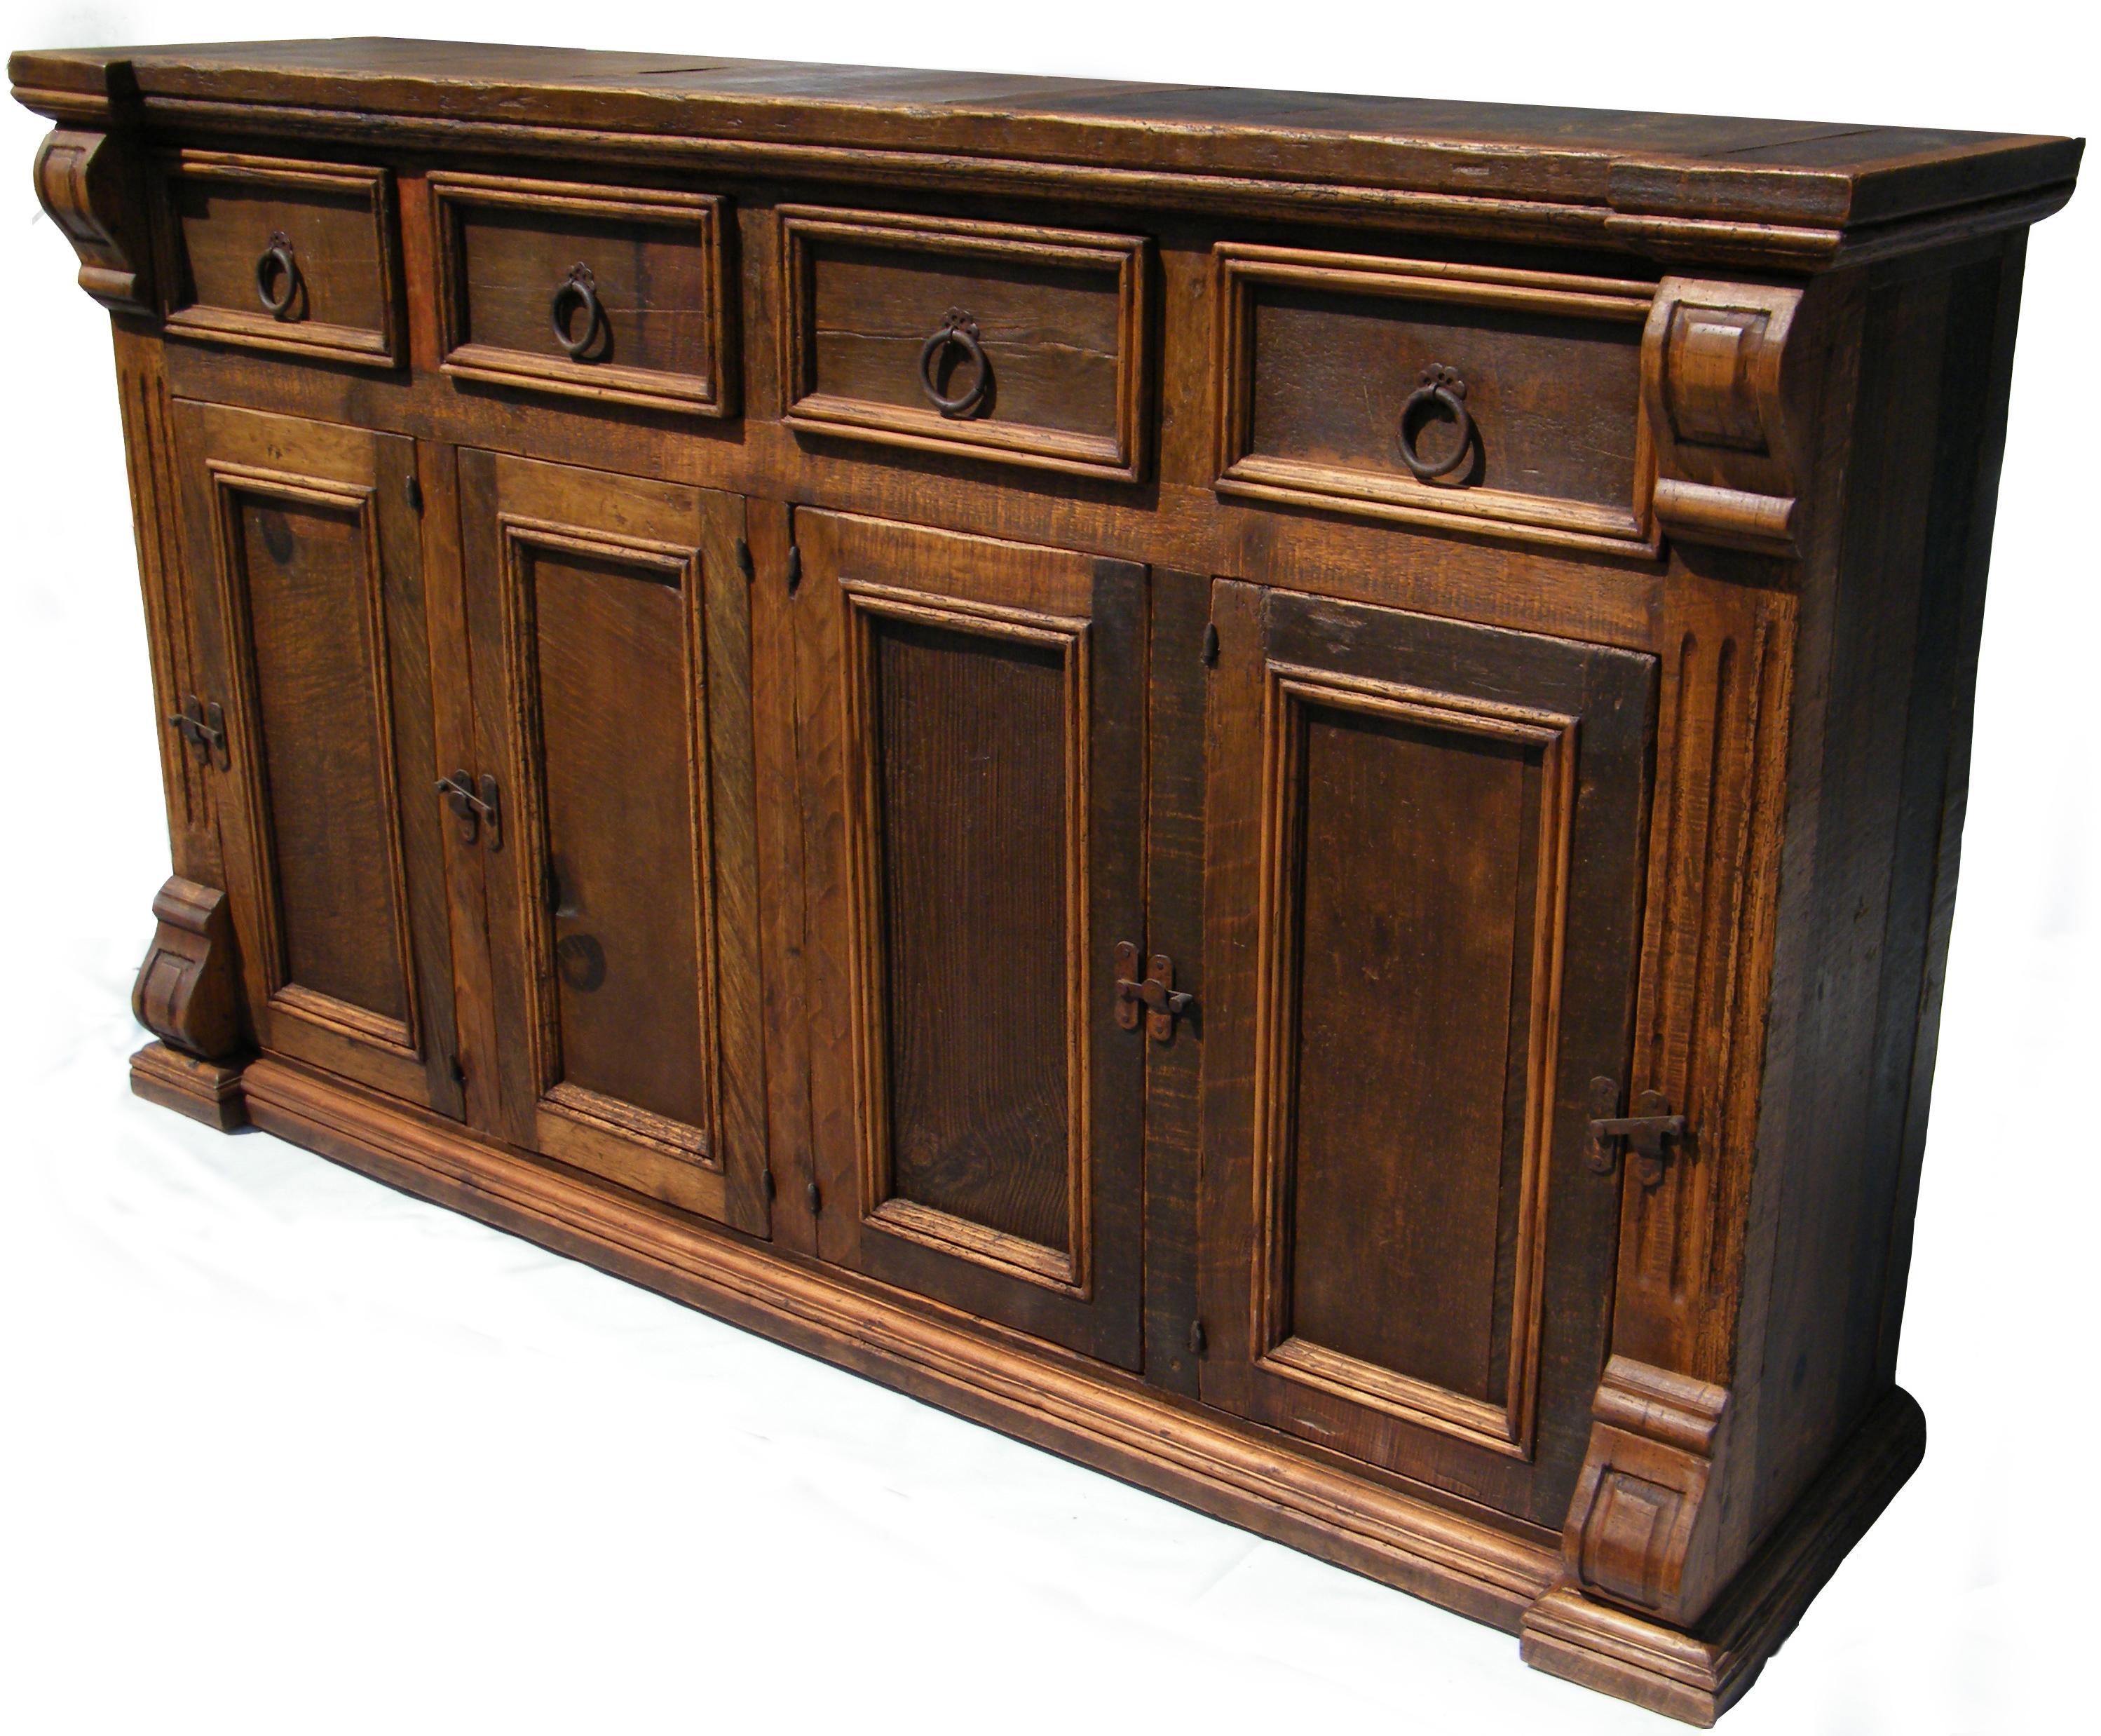 Genial Furniture Source International Logan Traditional 4 Drawer 4 Door Dining  Buffet